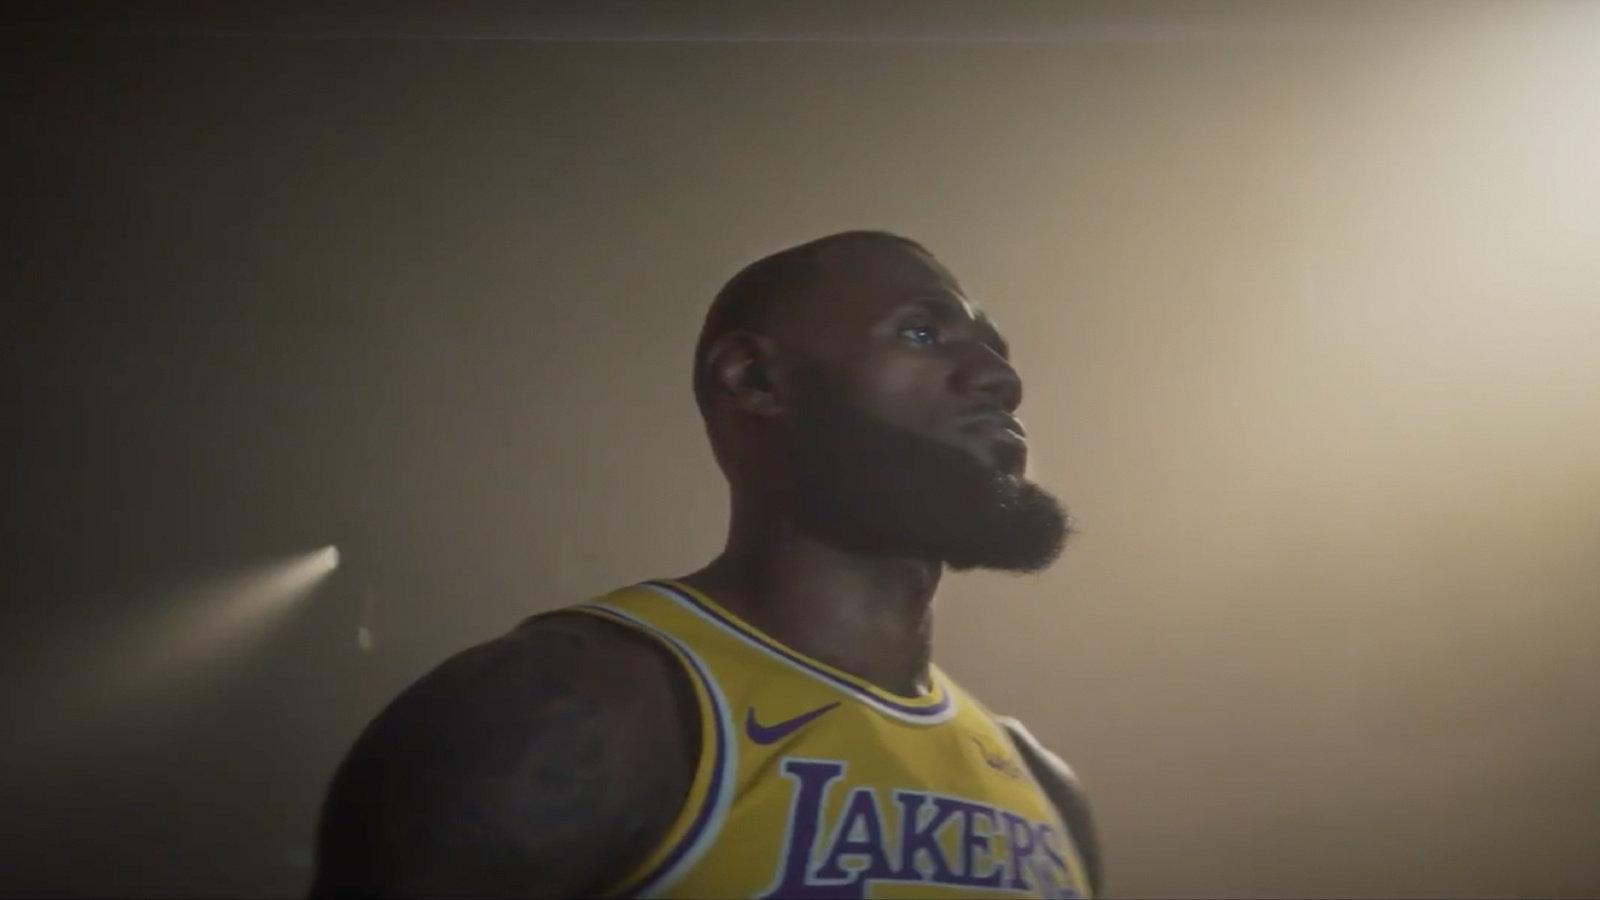 《NBA 2K19》20周年版新预告放出,勒布朗·詹姆斯领衔主演